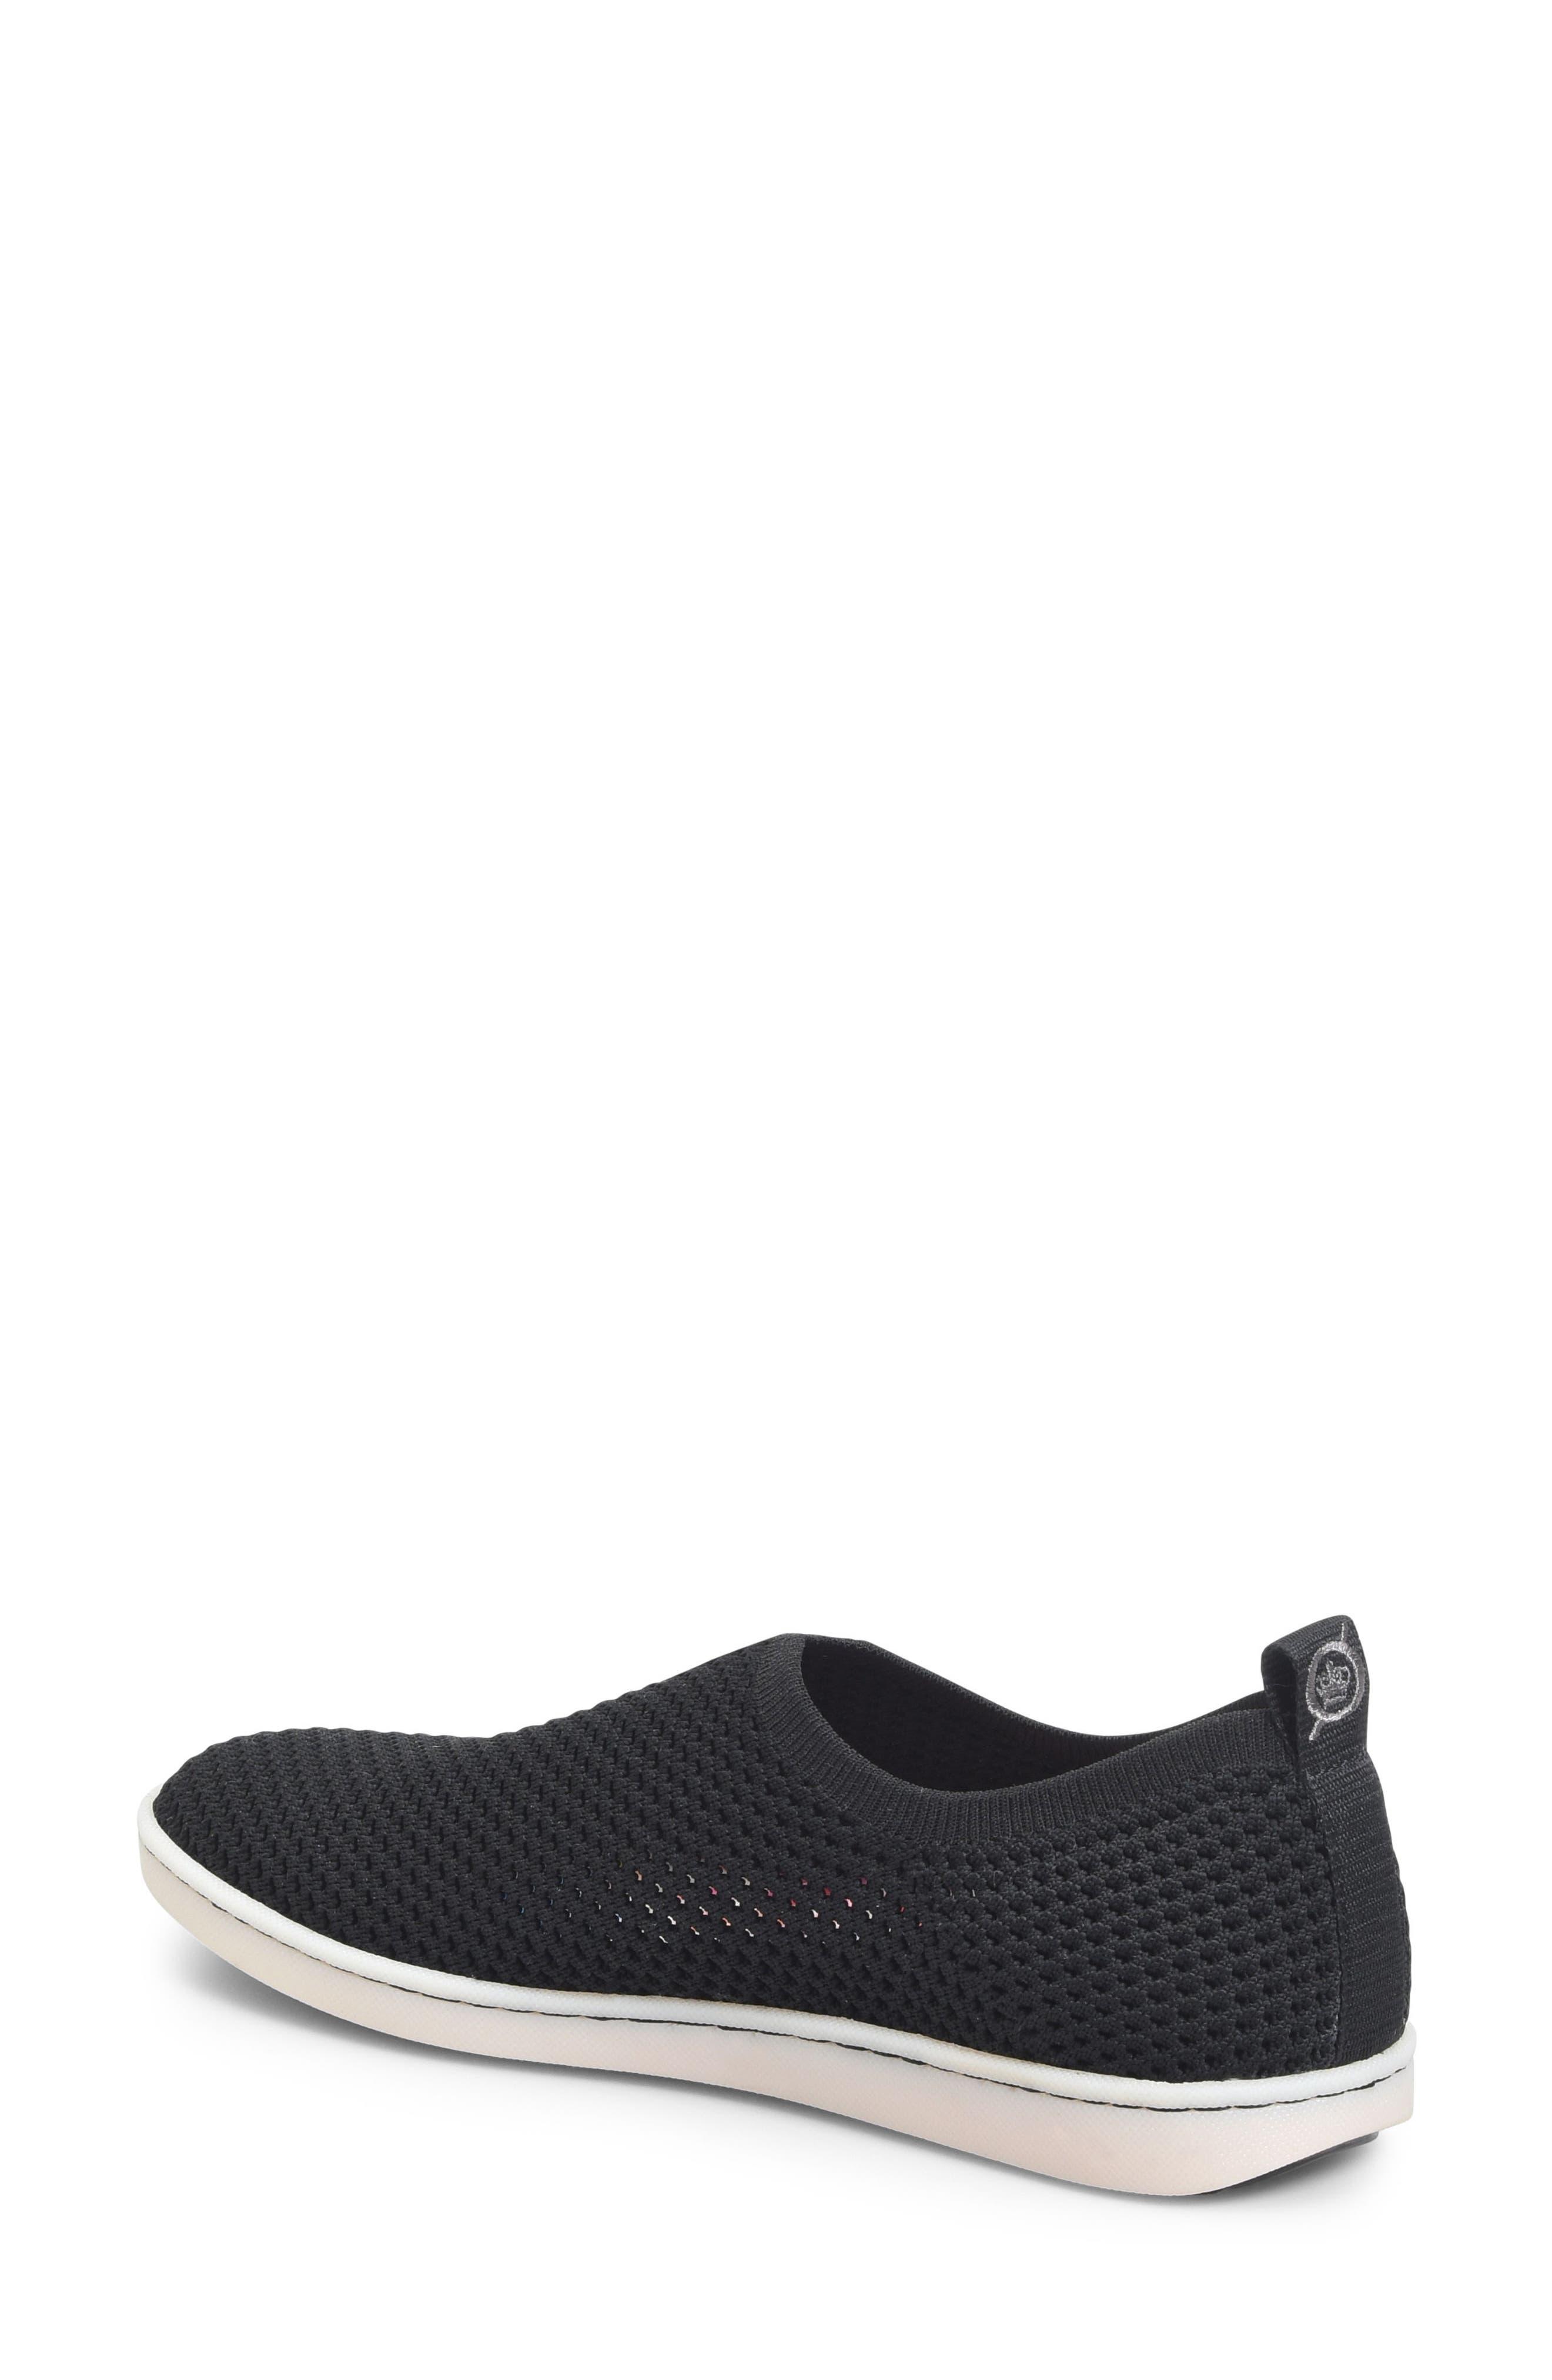 Hazy Slip-On Sneaker,                             Alternate thumbnail 2, color,                             Black Fabric